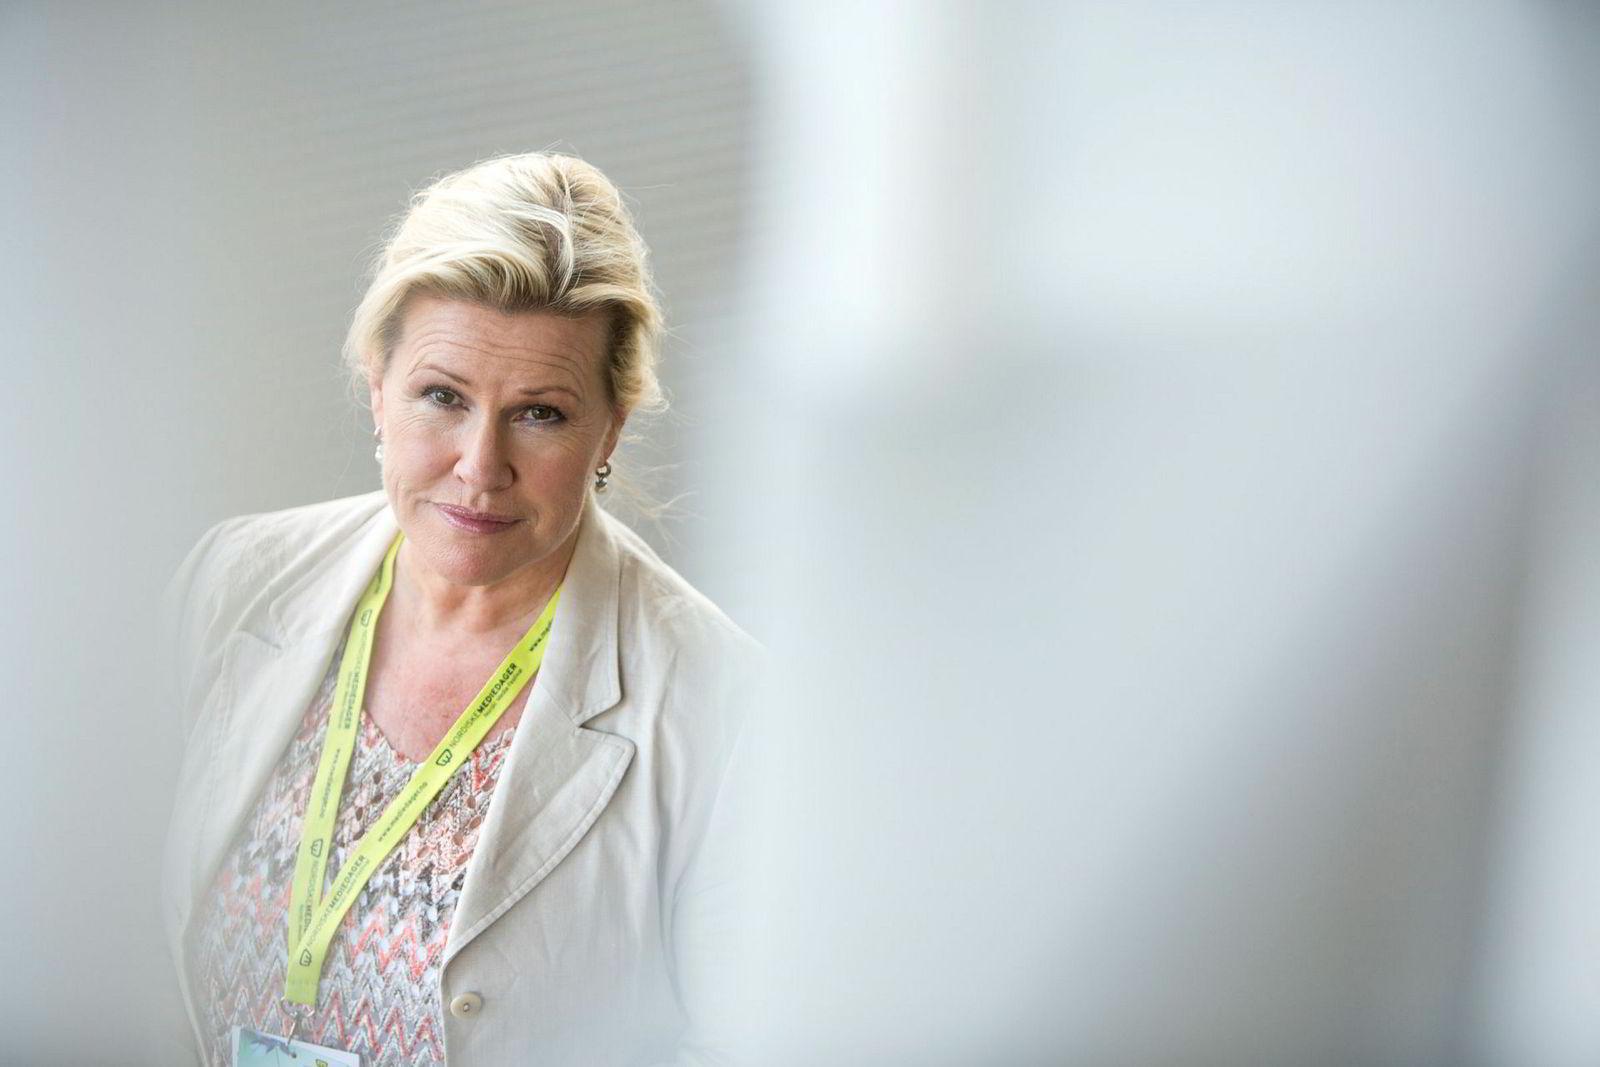 Festivalsjef for Nordiske Mediedager, Guri Heftye.